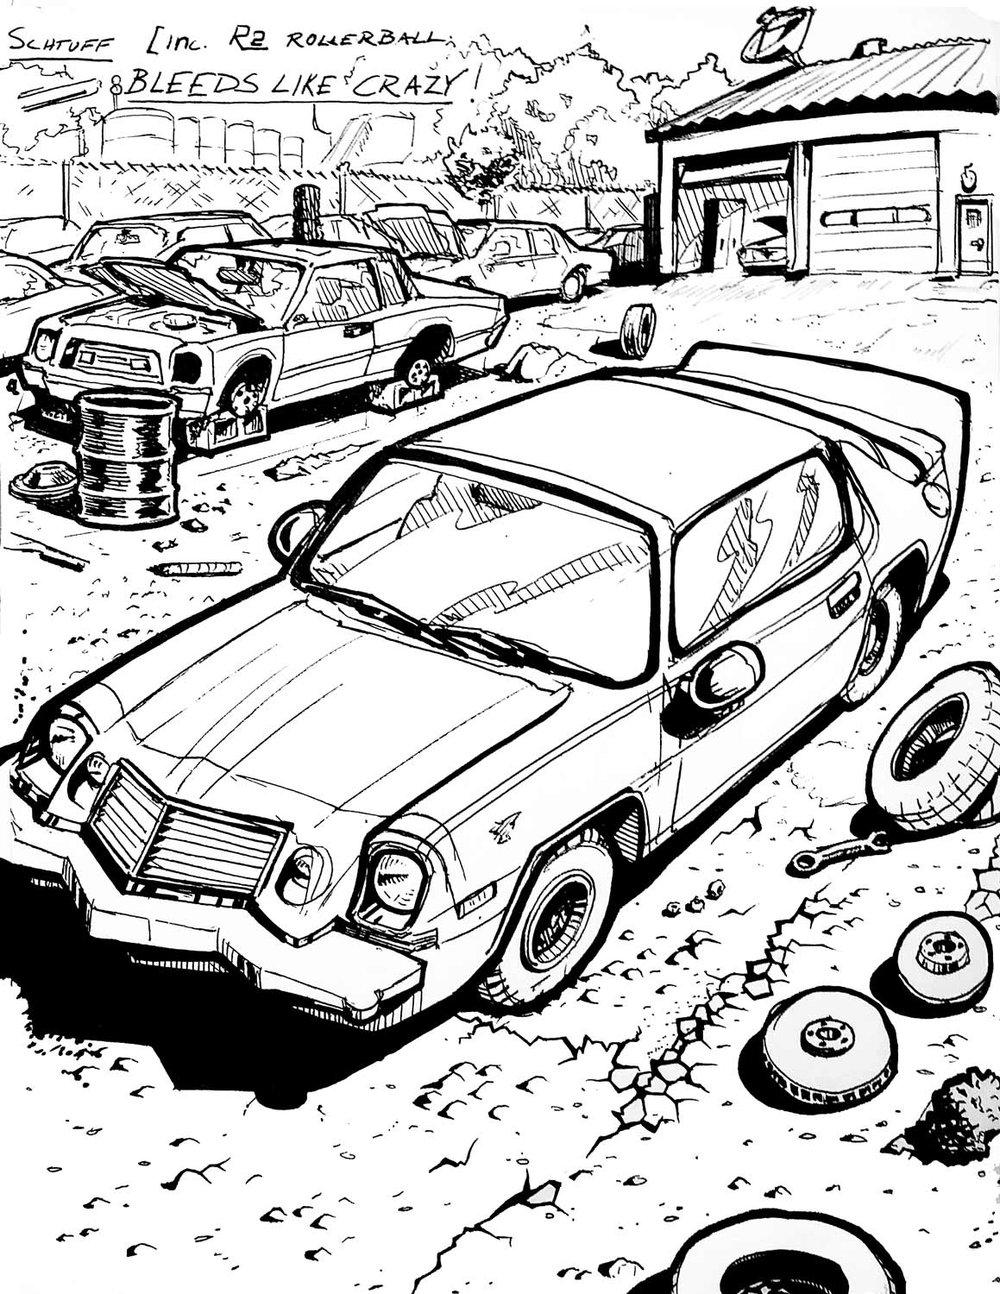 car_shop_web.jpg